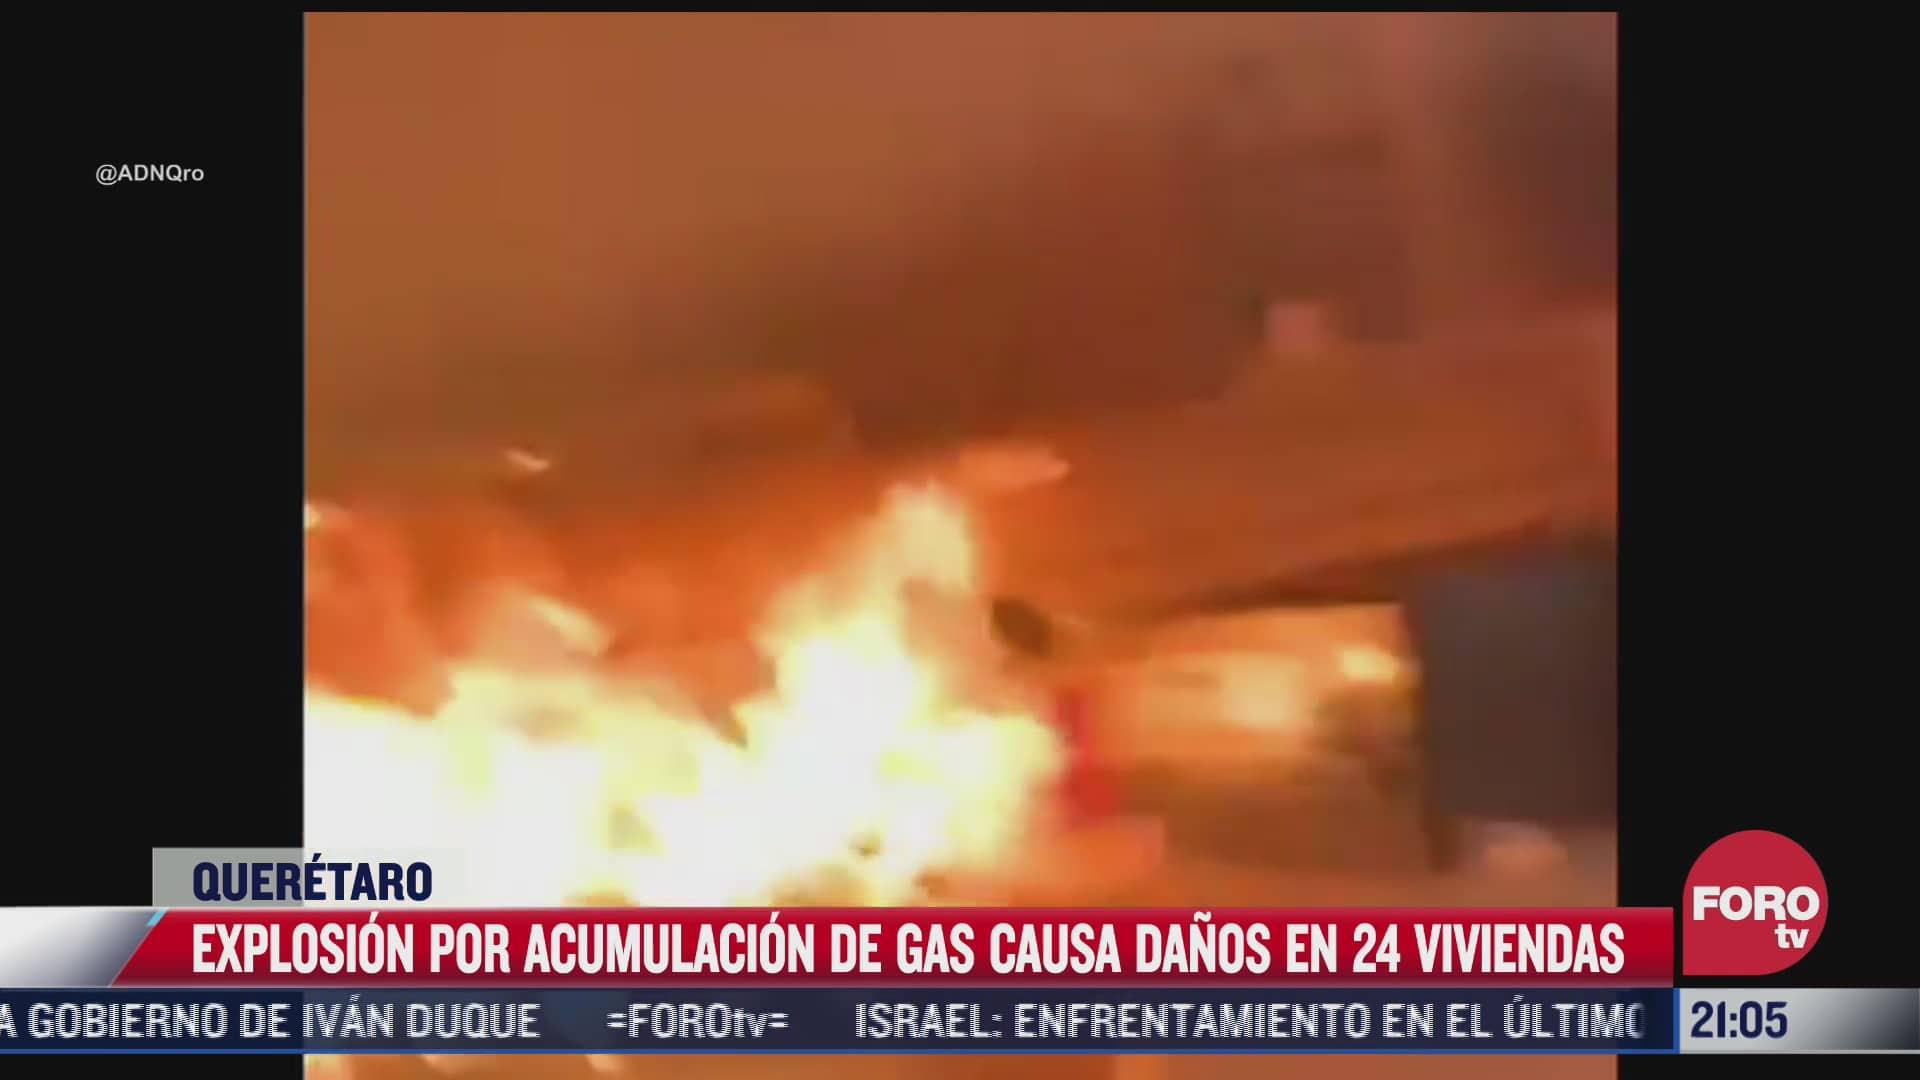 Explosión por acumulación de gas causa daños en 24 viviendas en Querétaro